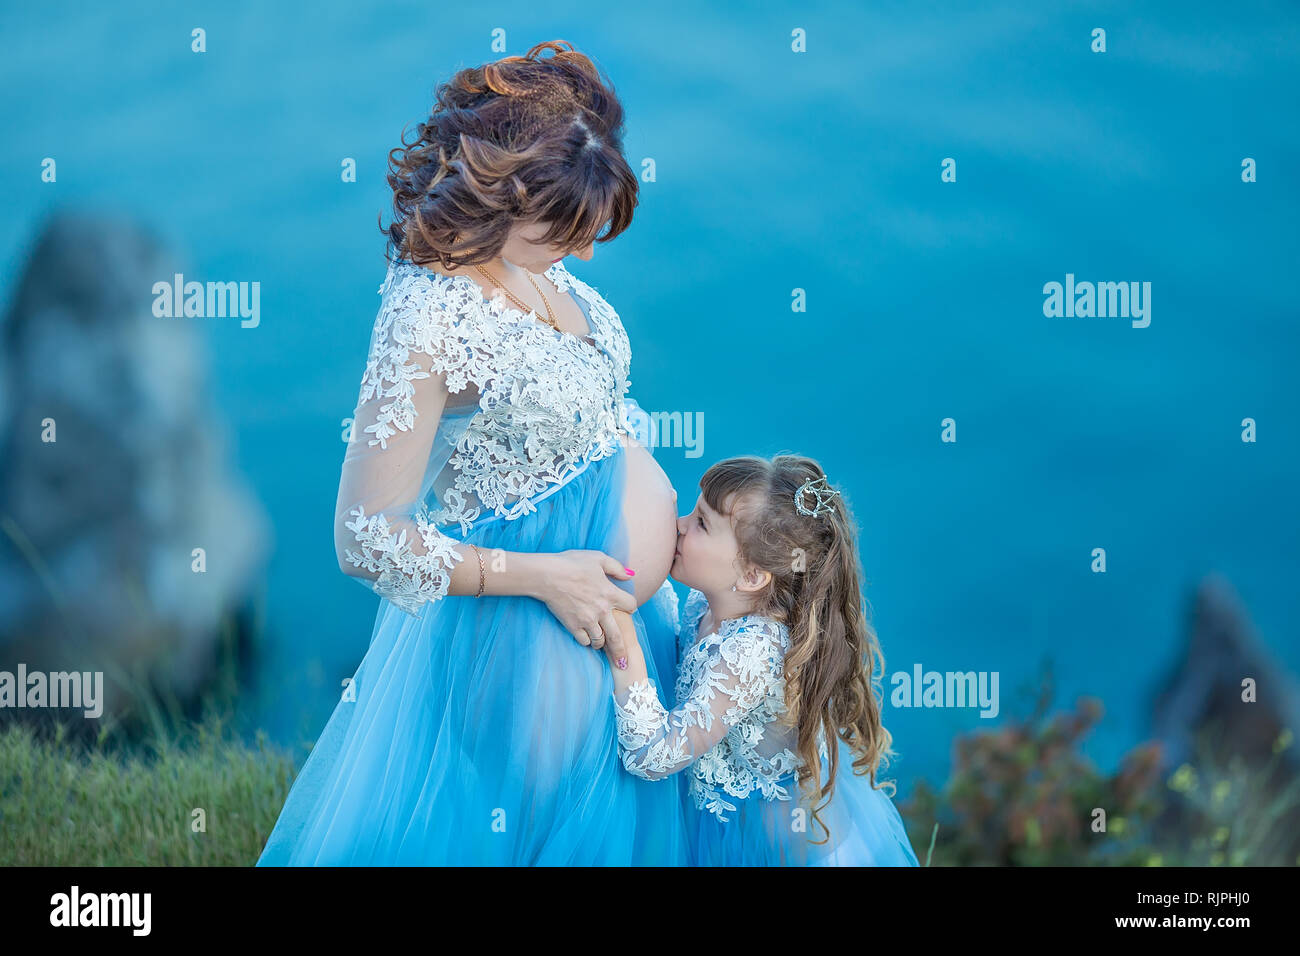 e3611161cf5c9 Beautiful Pregnant Woman in romantic flying dress at sea shore near ancient  ruins of Greece city